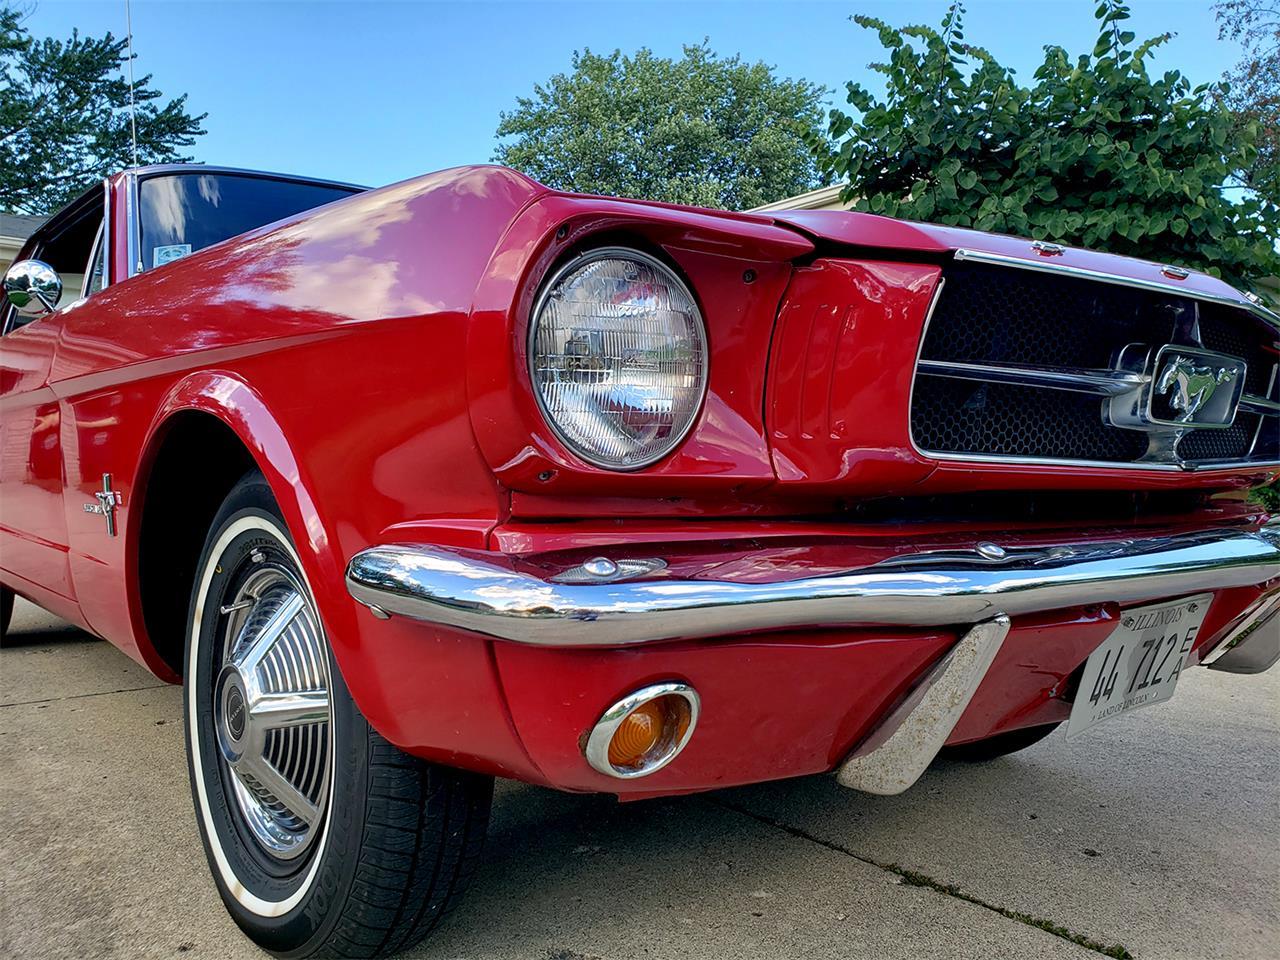 Ford Mustang 1965 dossier dispo 1965 prix tout compris